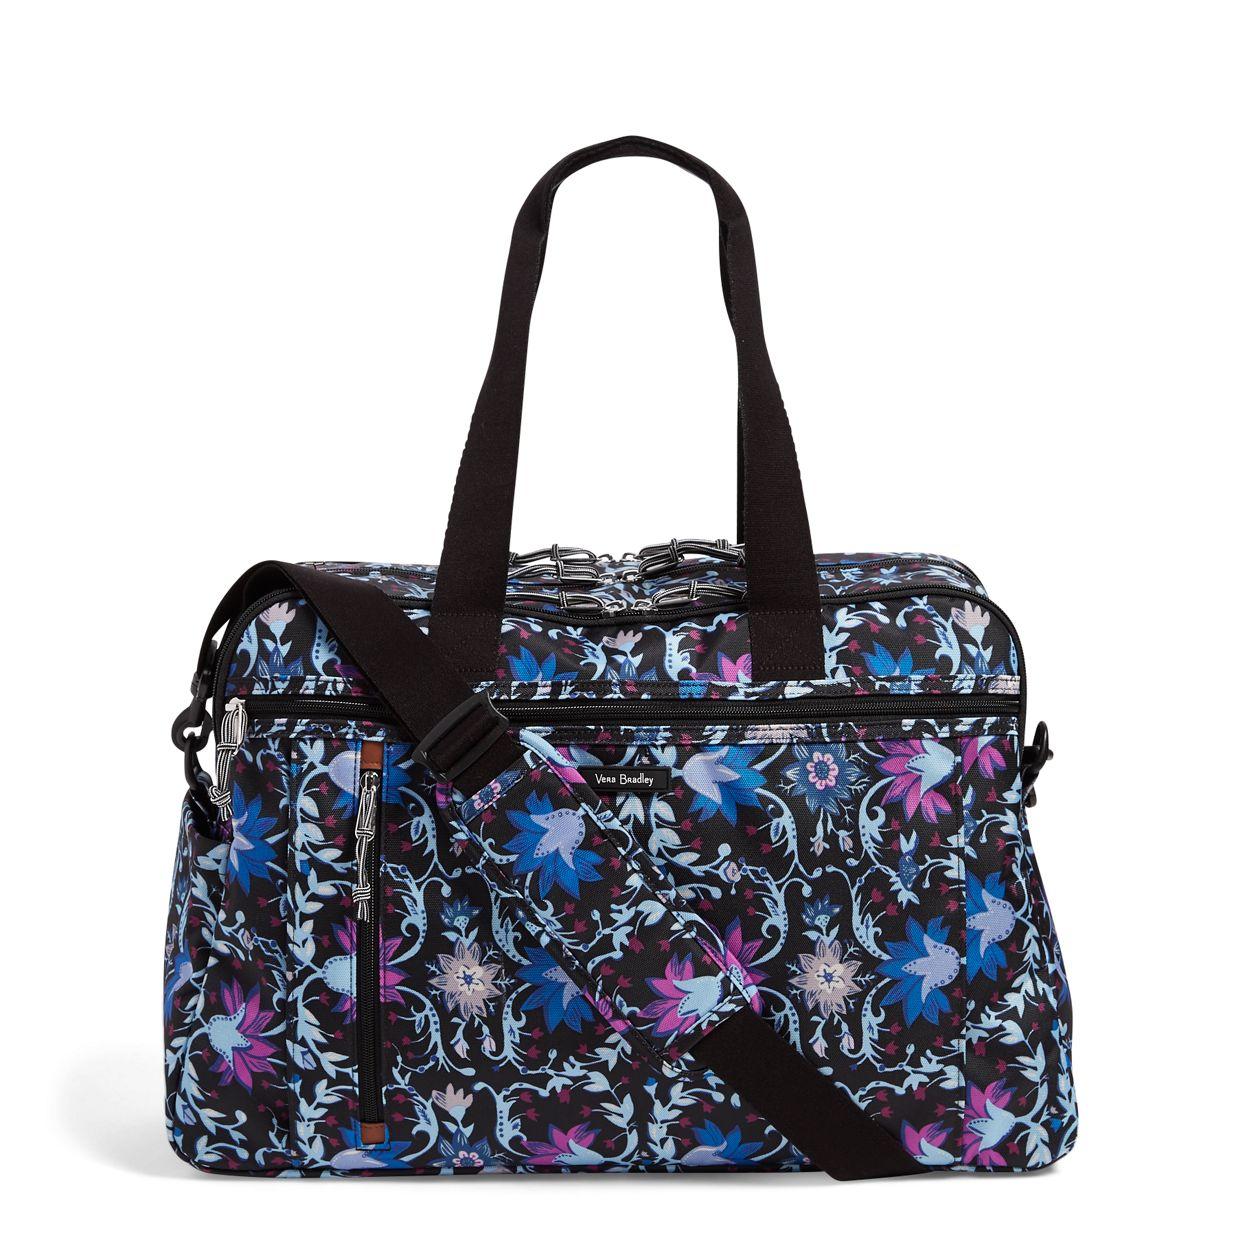 f7e3f12b1 Image of Lighten Up Weekender Travel Bag in Bramble Vines ...